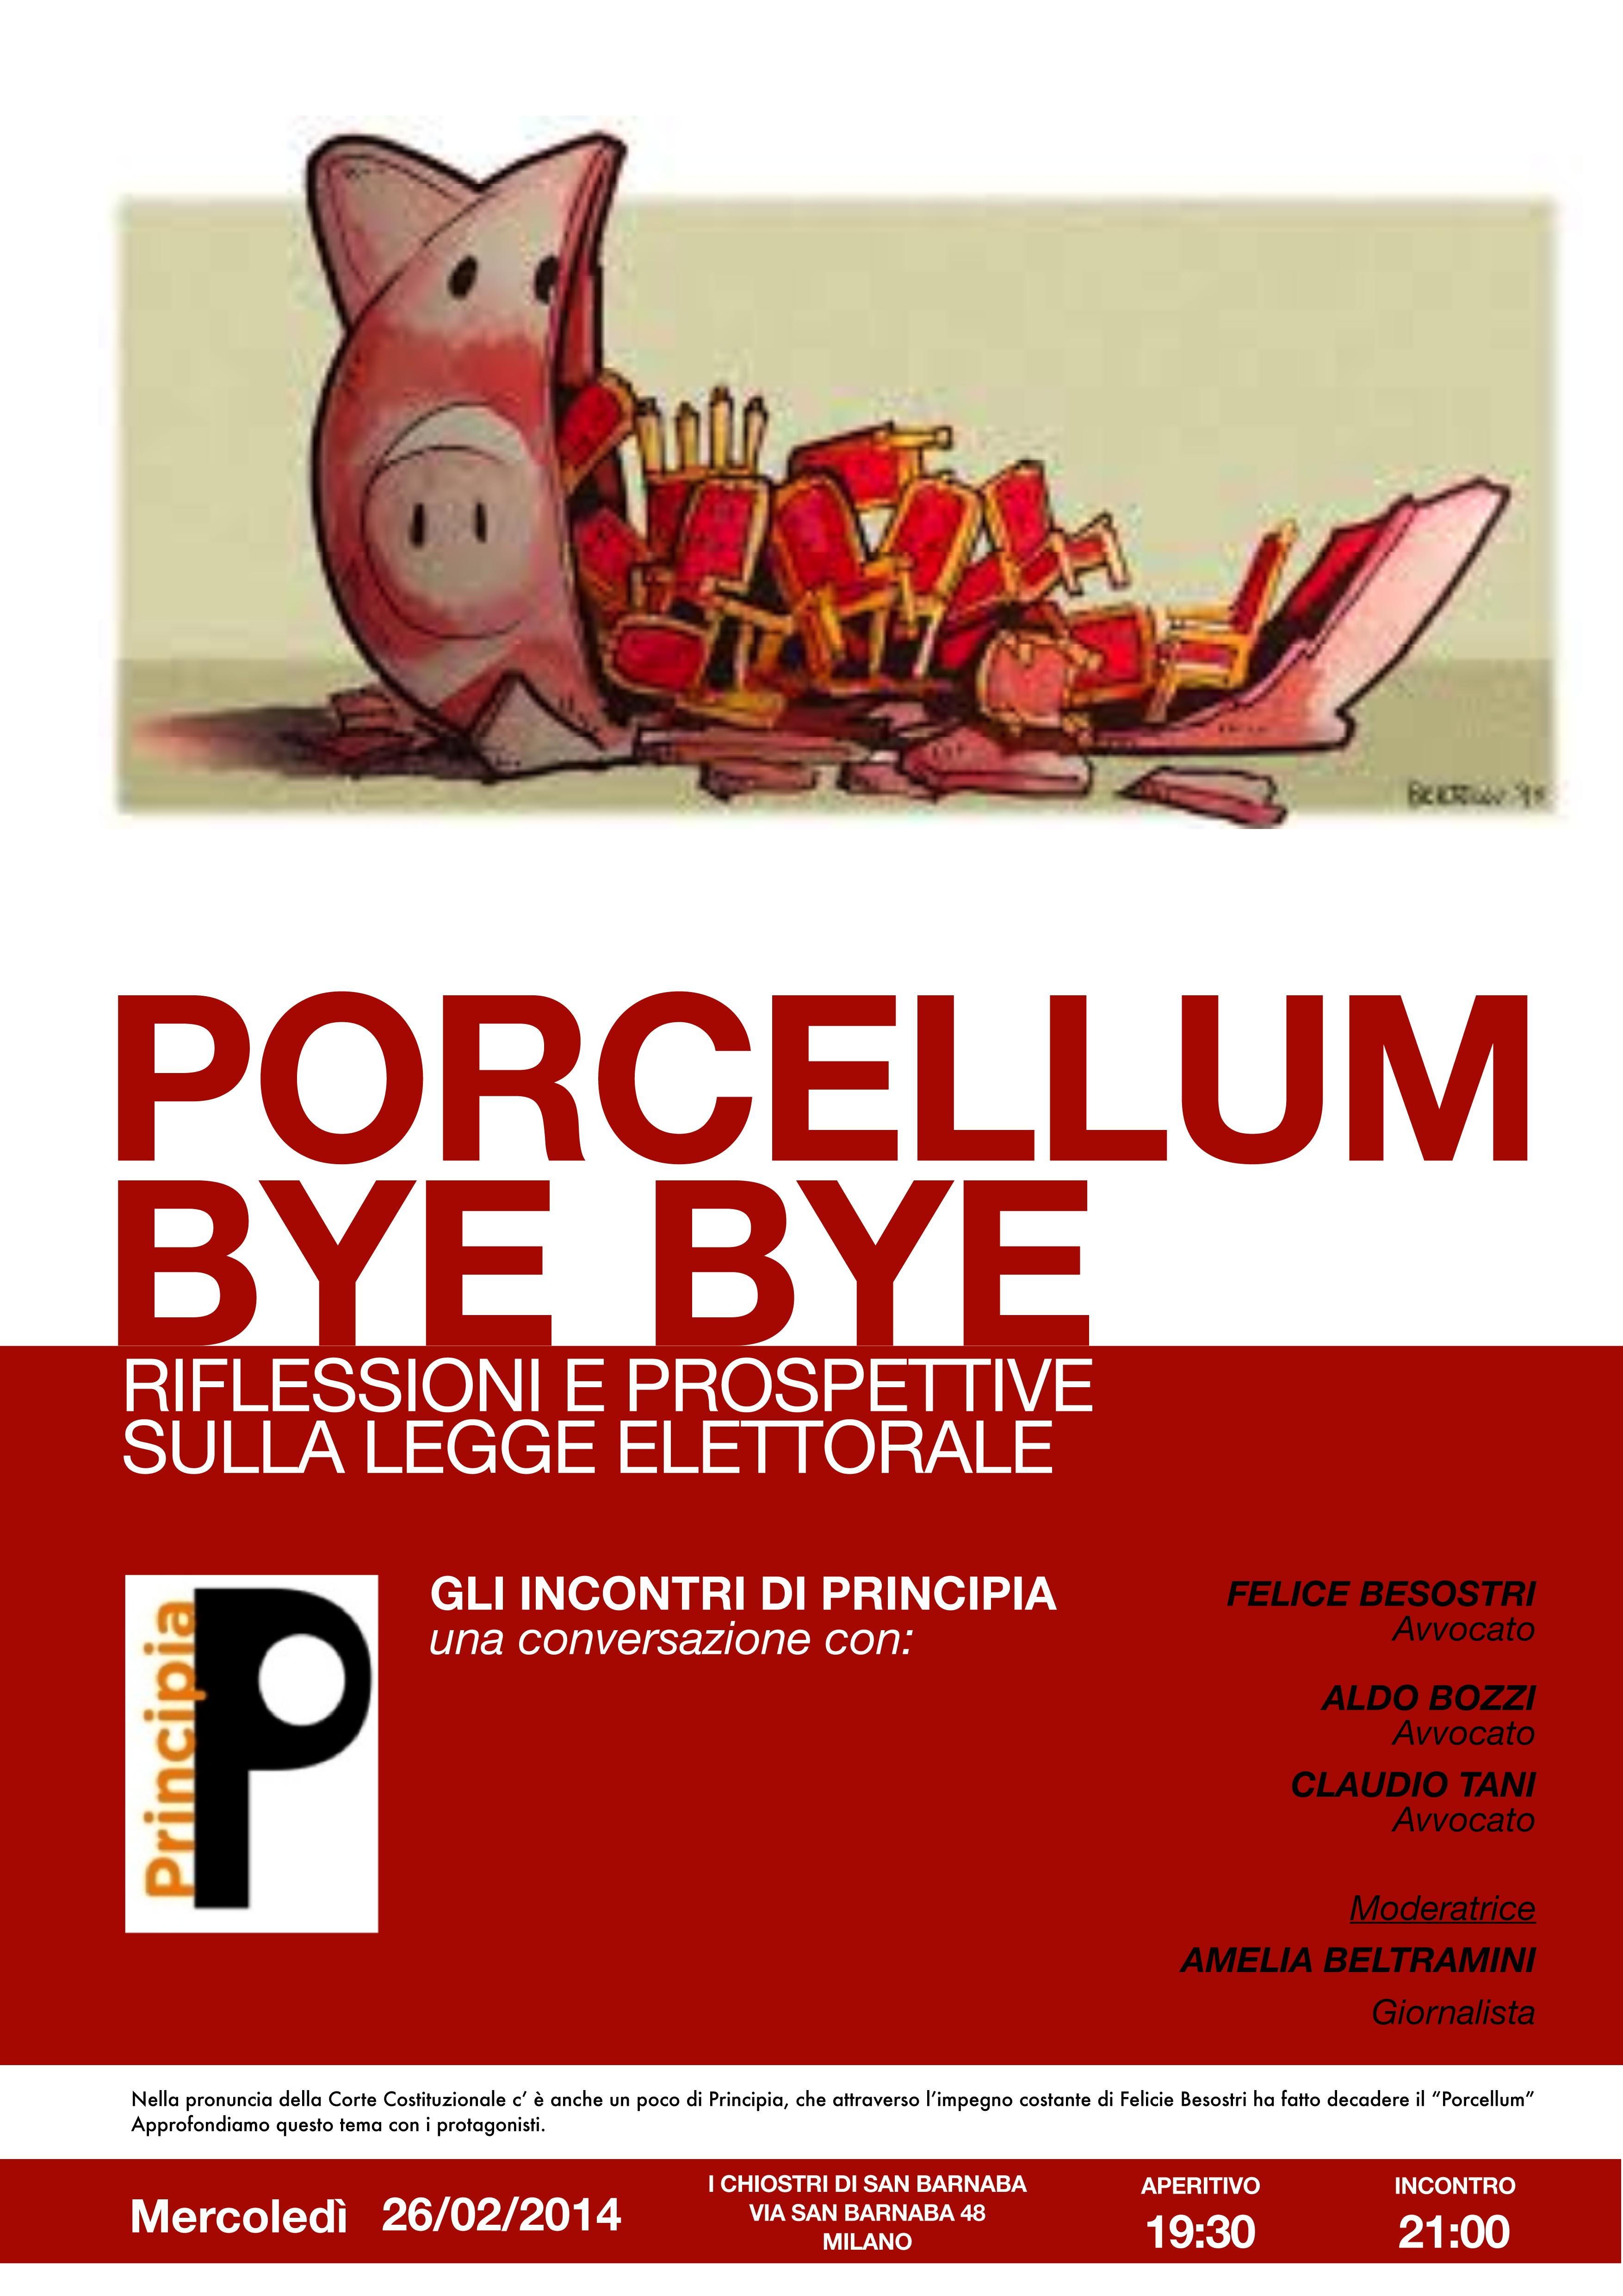 Porcellum BYE BYE 3